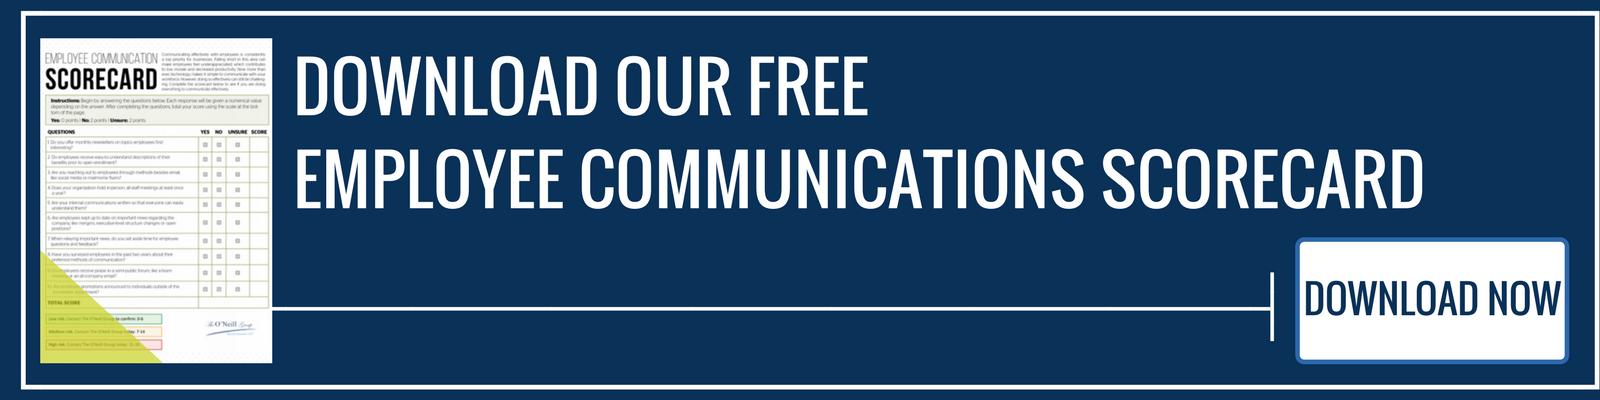 Employee Communications Scorecard